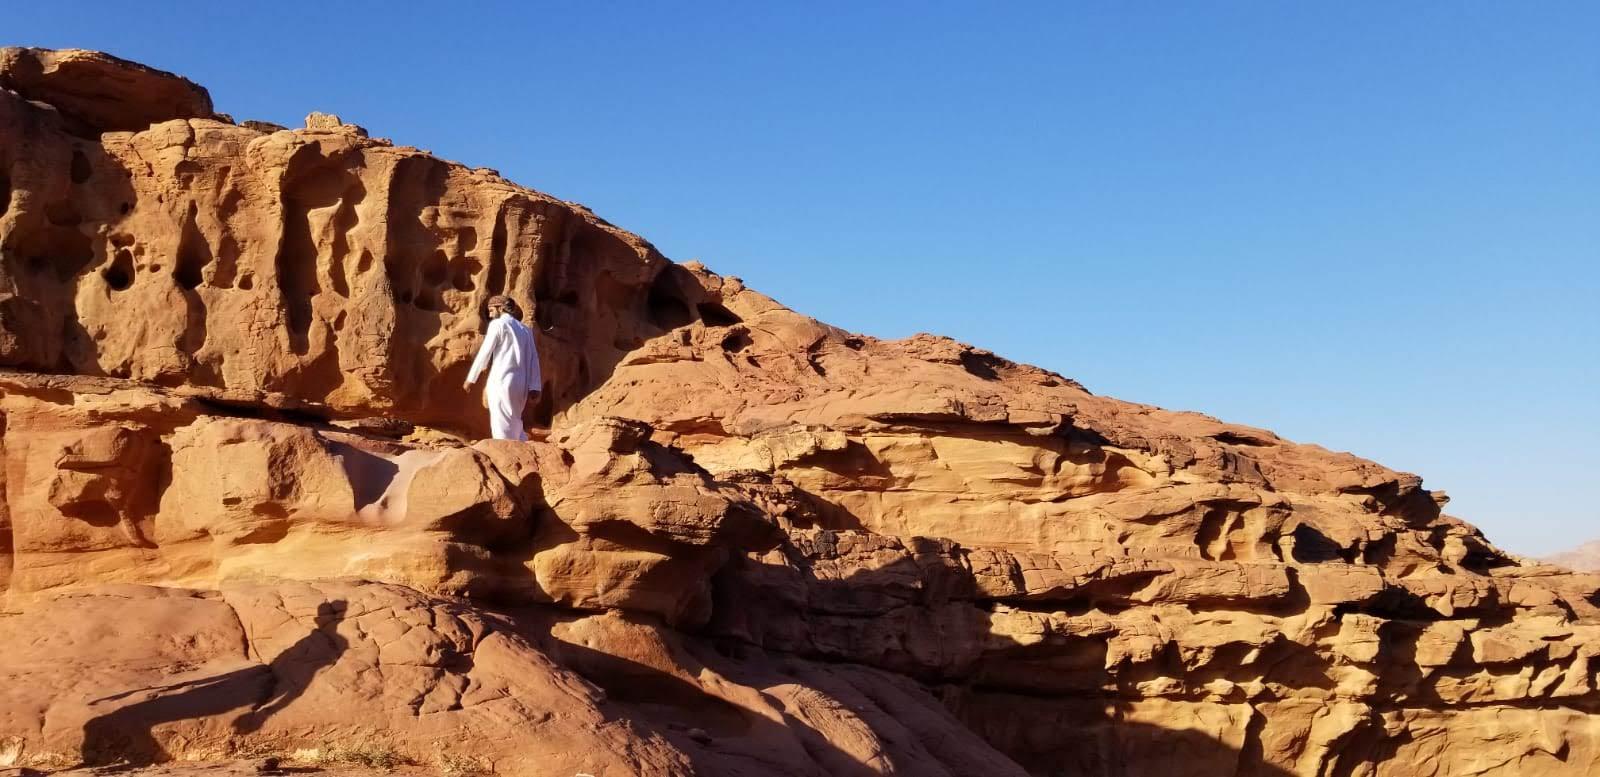 Explore Wadi Rum With A Local On The Wadi Rum Jeep Tour Safari From Aqaba